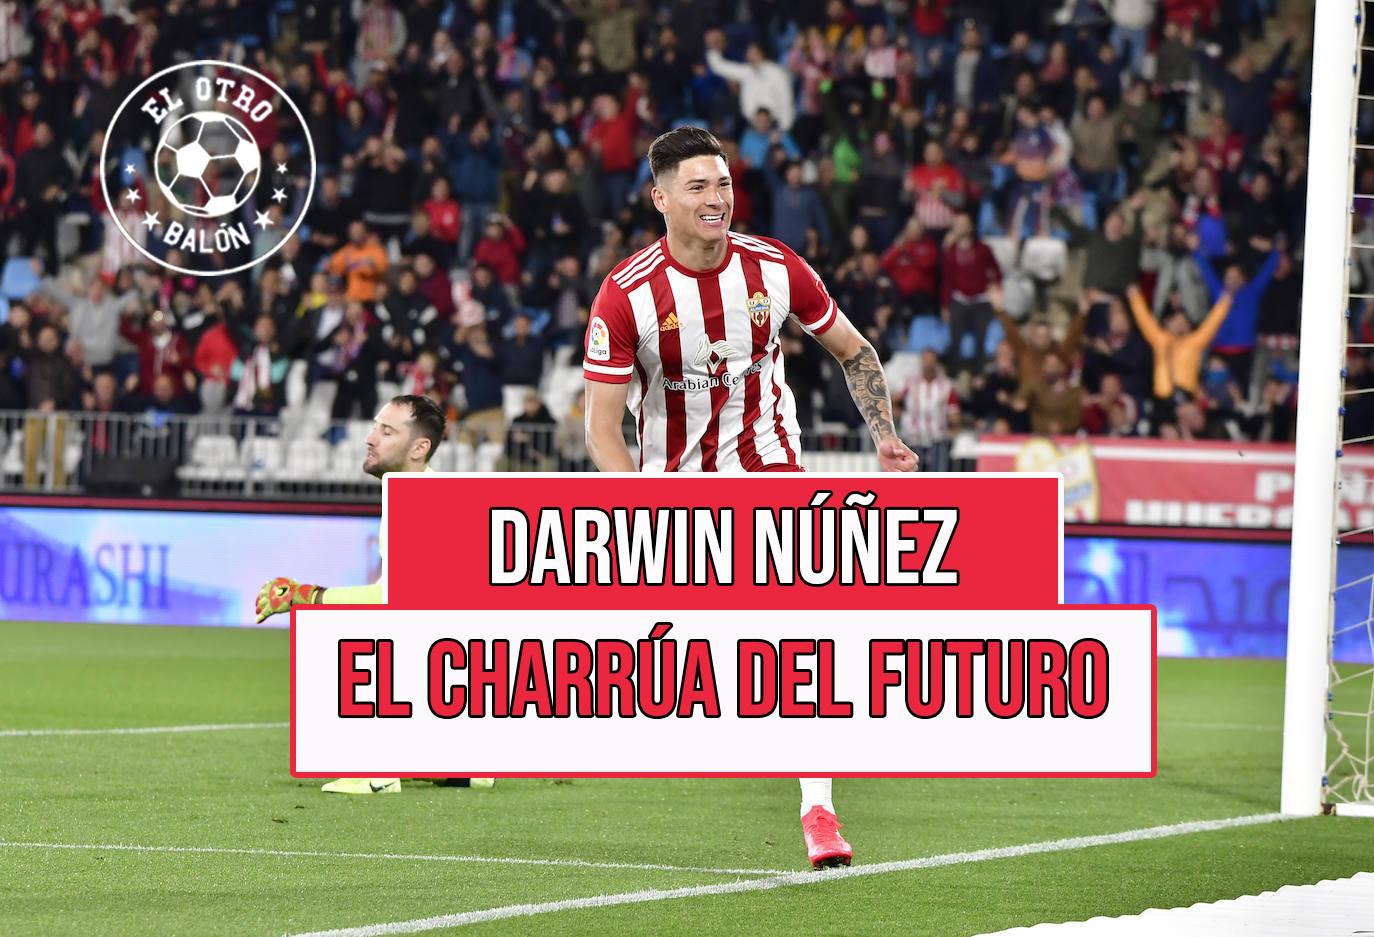 Darwin Núñez, el charrúa del futuro